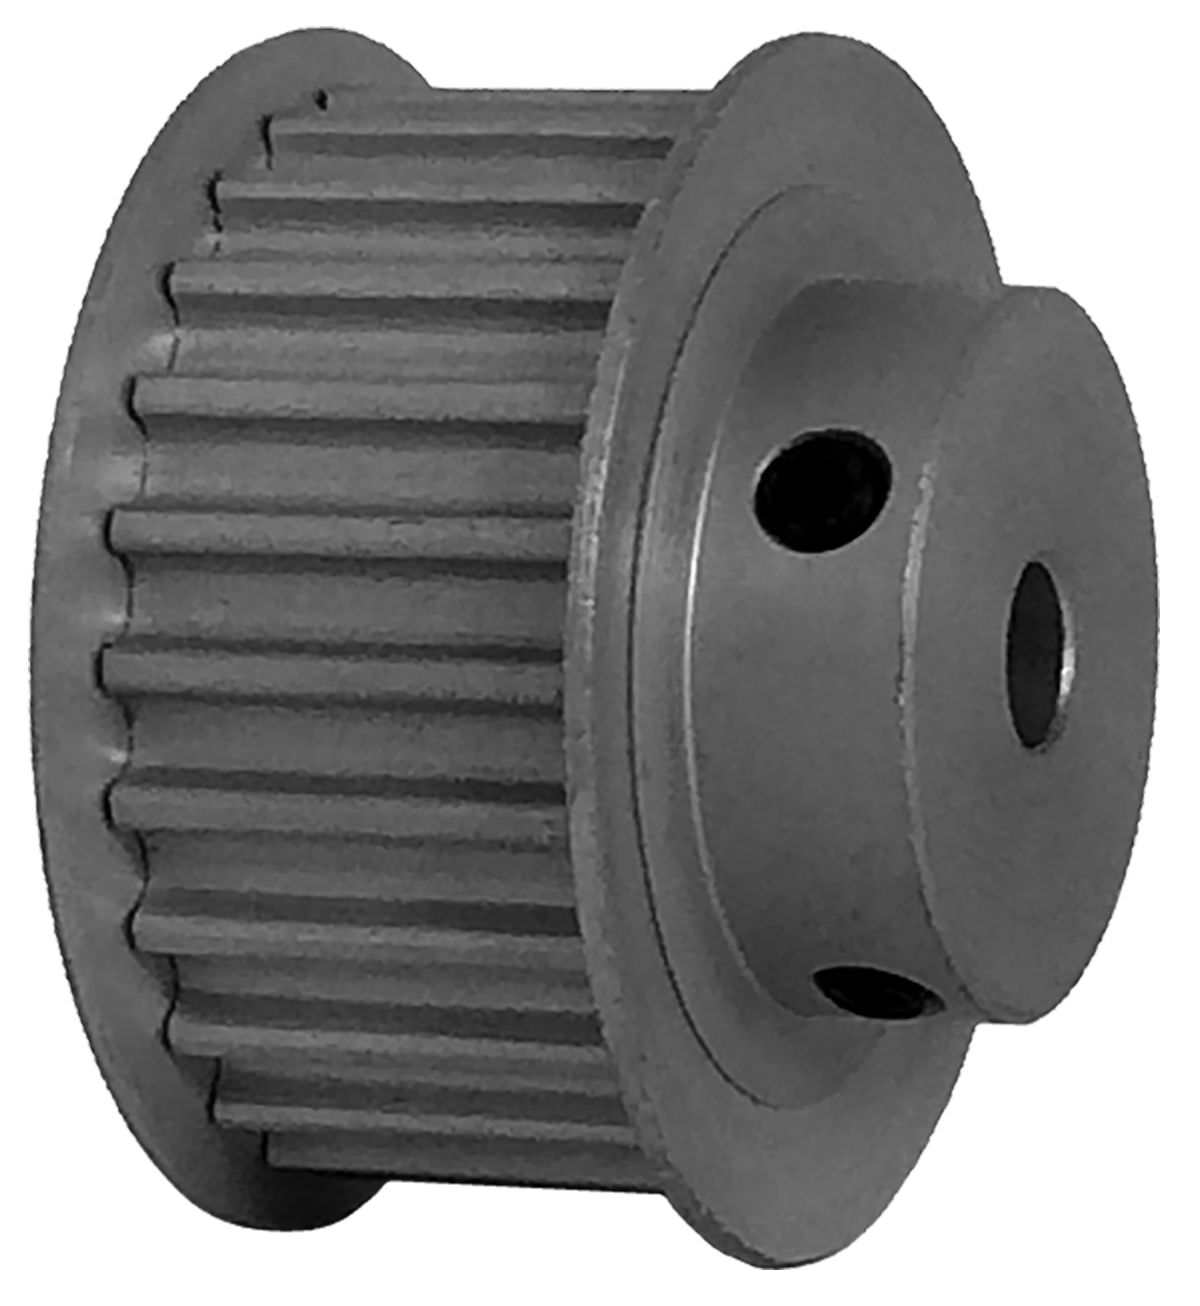 25-5M15-6FA3 - Aluminum Powerhouse®HTD® Pulleys